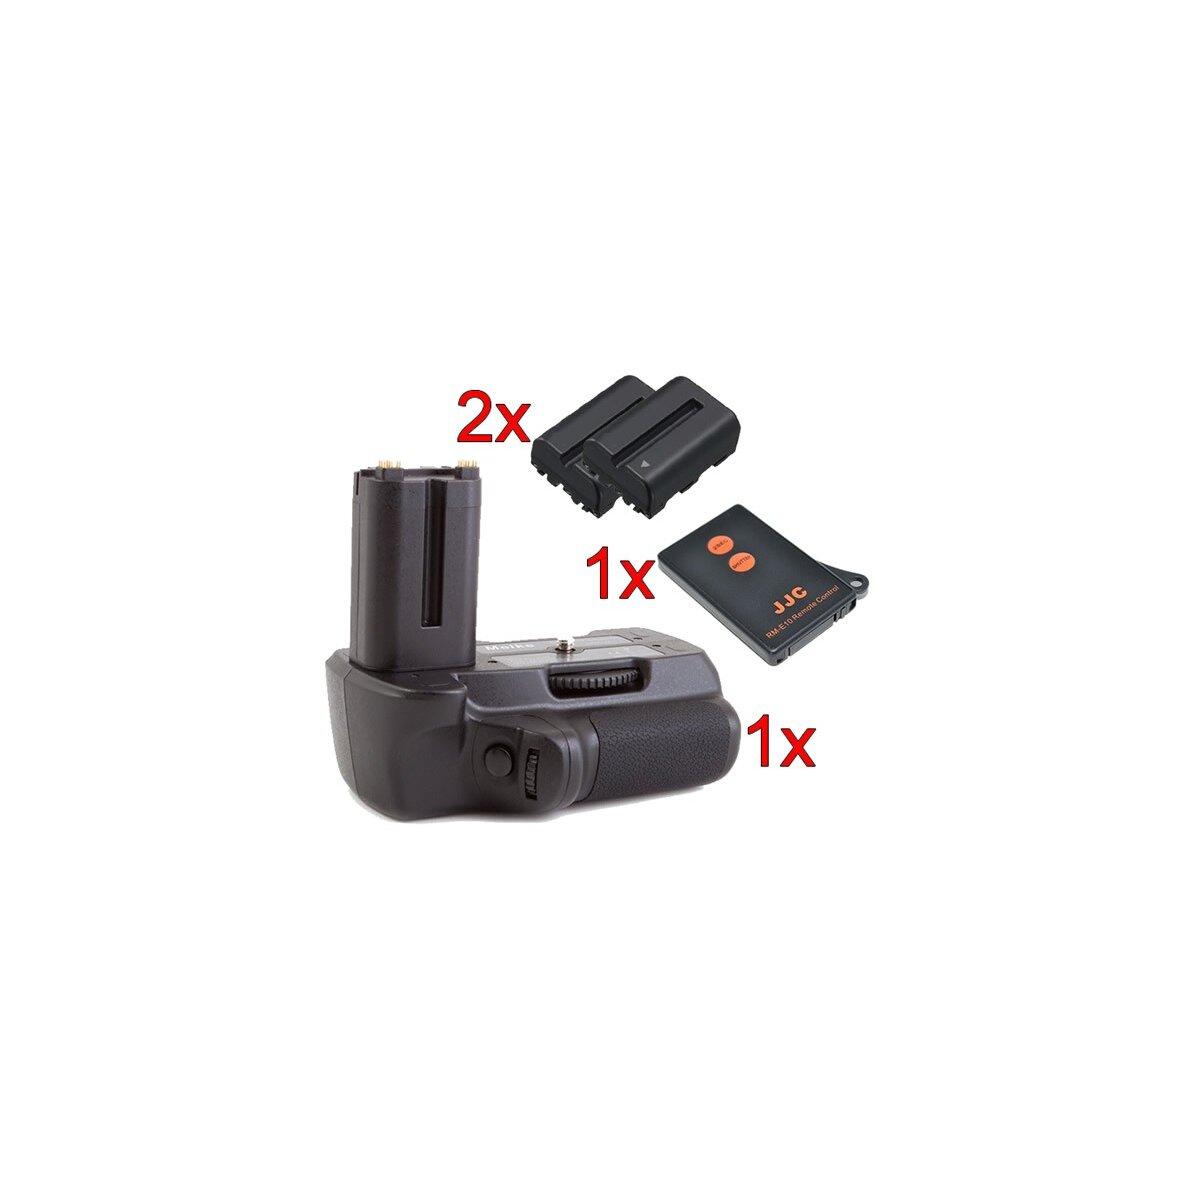 Meike Profi Batteriegriff fuer Sony Alpha A450, A300 und A200 als VG-B30AM Ersatz + 2 NP-FM500H Nachbau-Akkus + 1x Infrarot Fernbedienung!